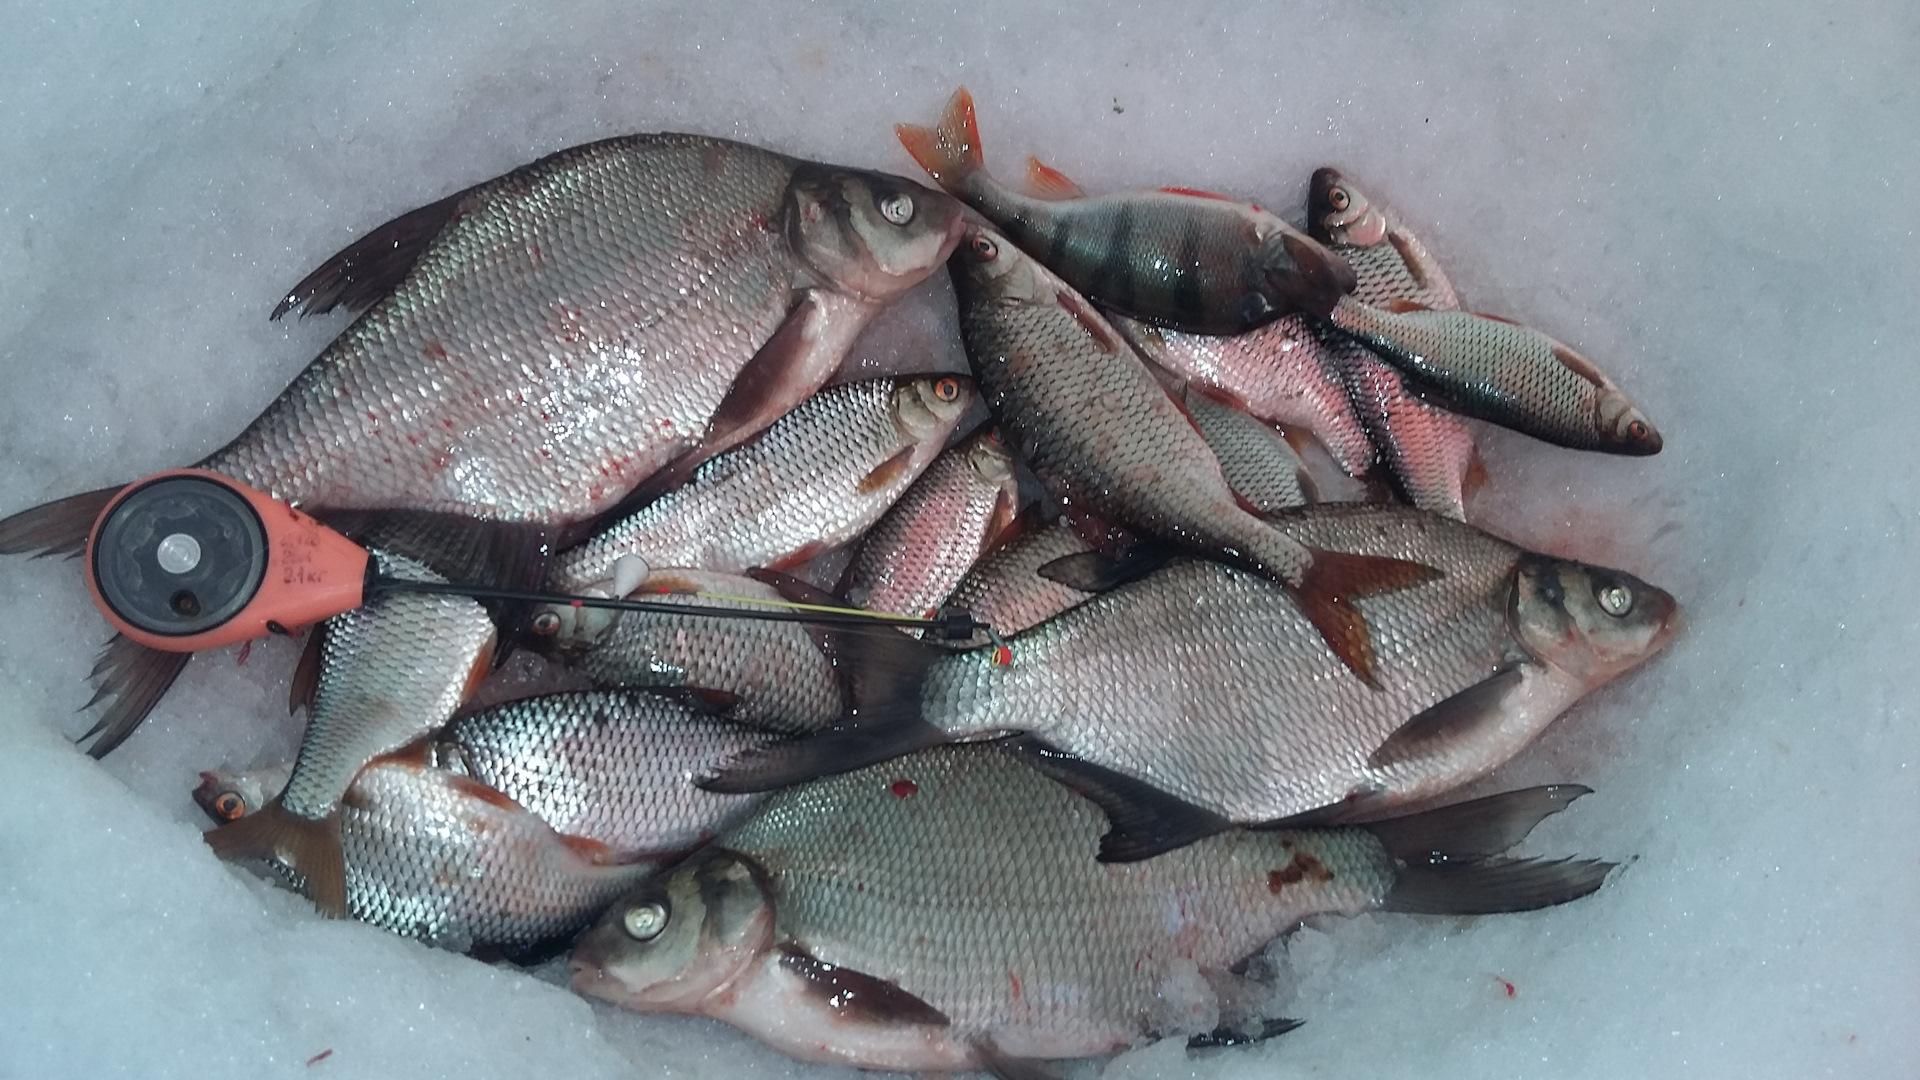 рыбалка на воронежском водохранилище картинки христианстве например